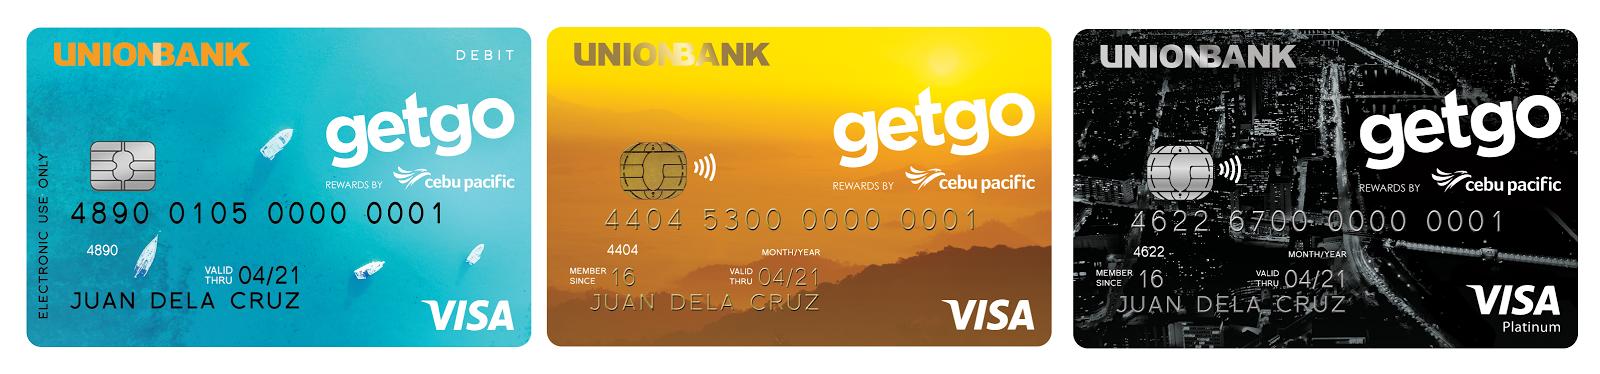 www.zhequia.com, FTW! Blog, #zhequiaDOTcom #FTWblog #GetGoPH #Klook #FlyForFree #UnionbankPh #FTWtravels